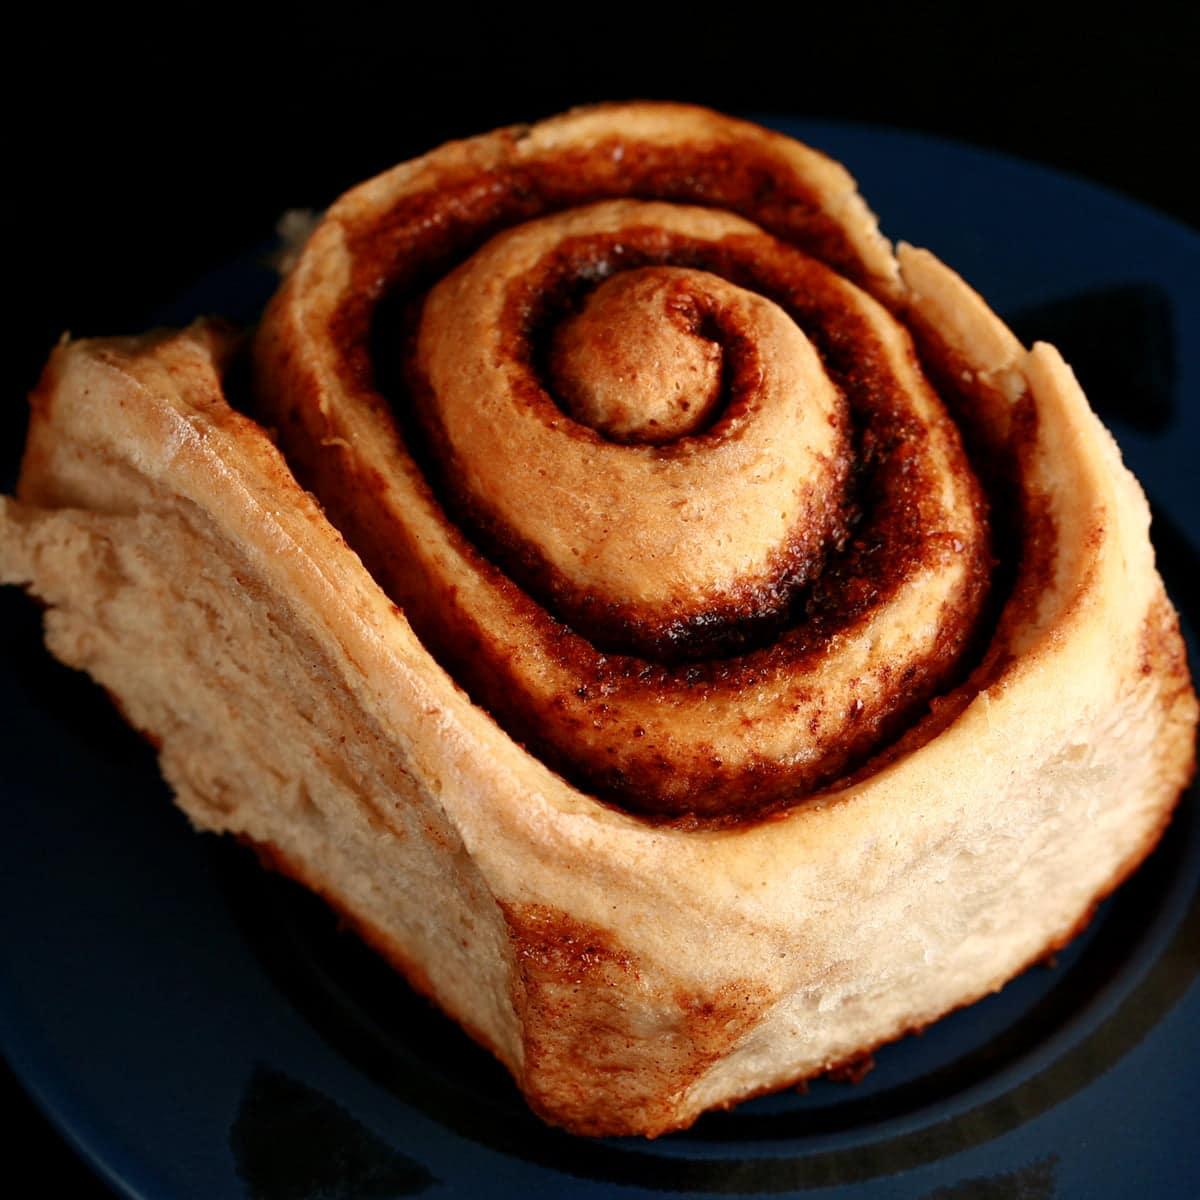 A single chai cinnamon bun on a plate.